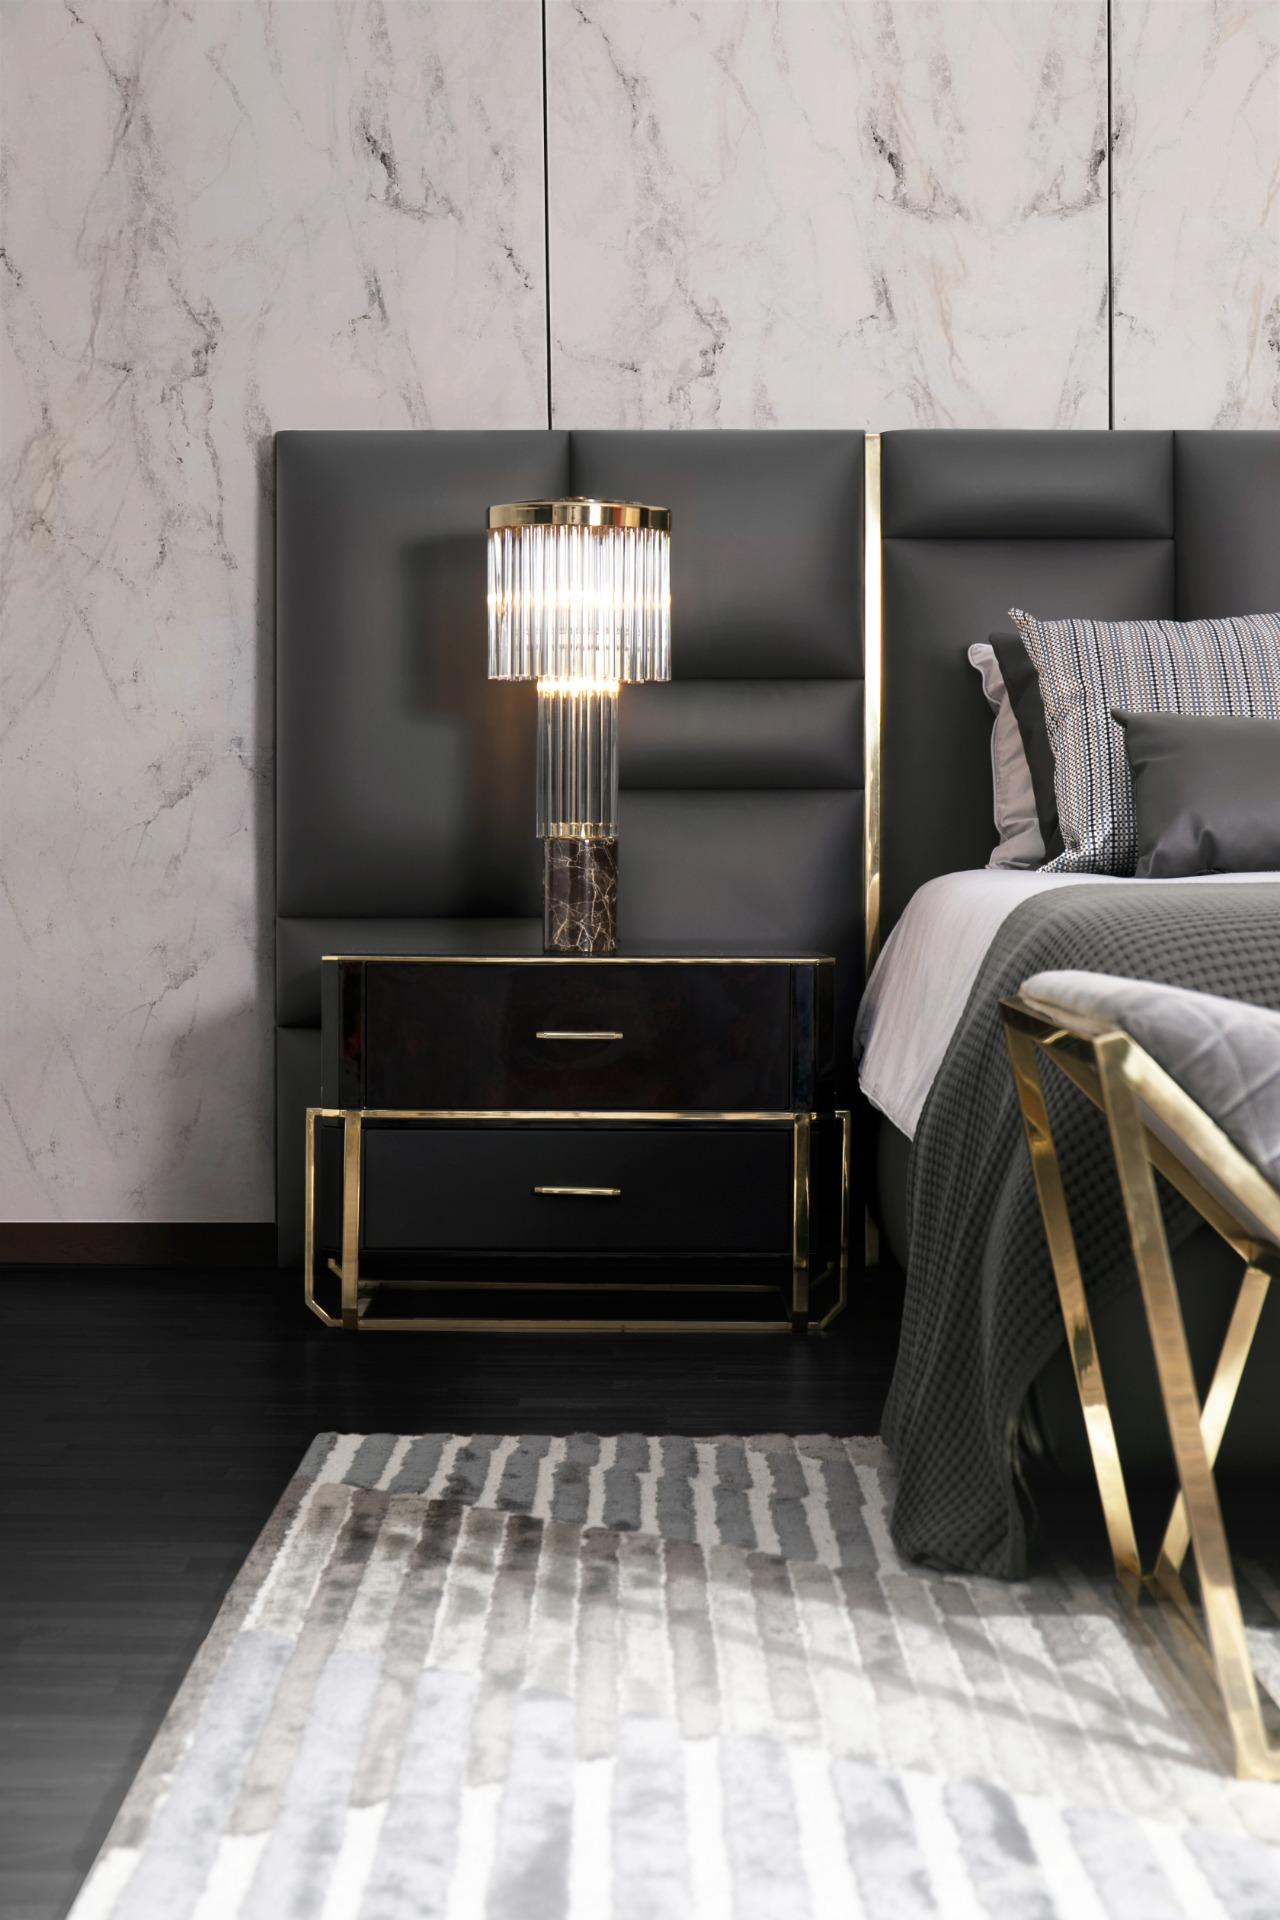 Insplosion_Dashing_and_luxurious_minimalist-Bedrooms-design_Luxxu